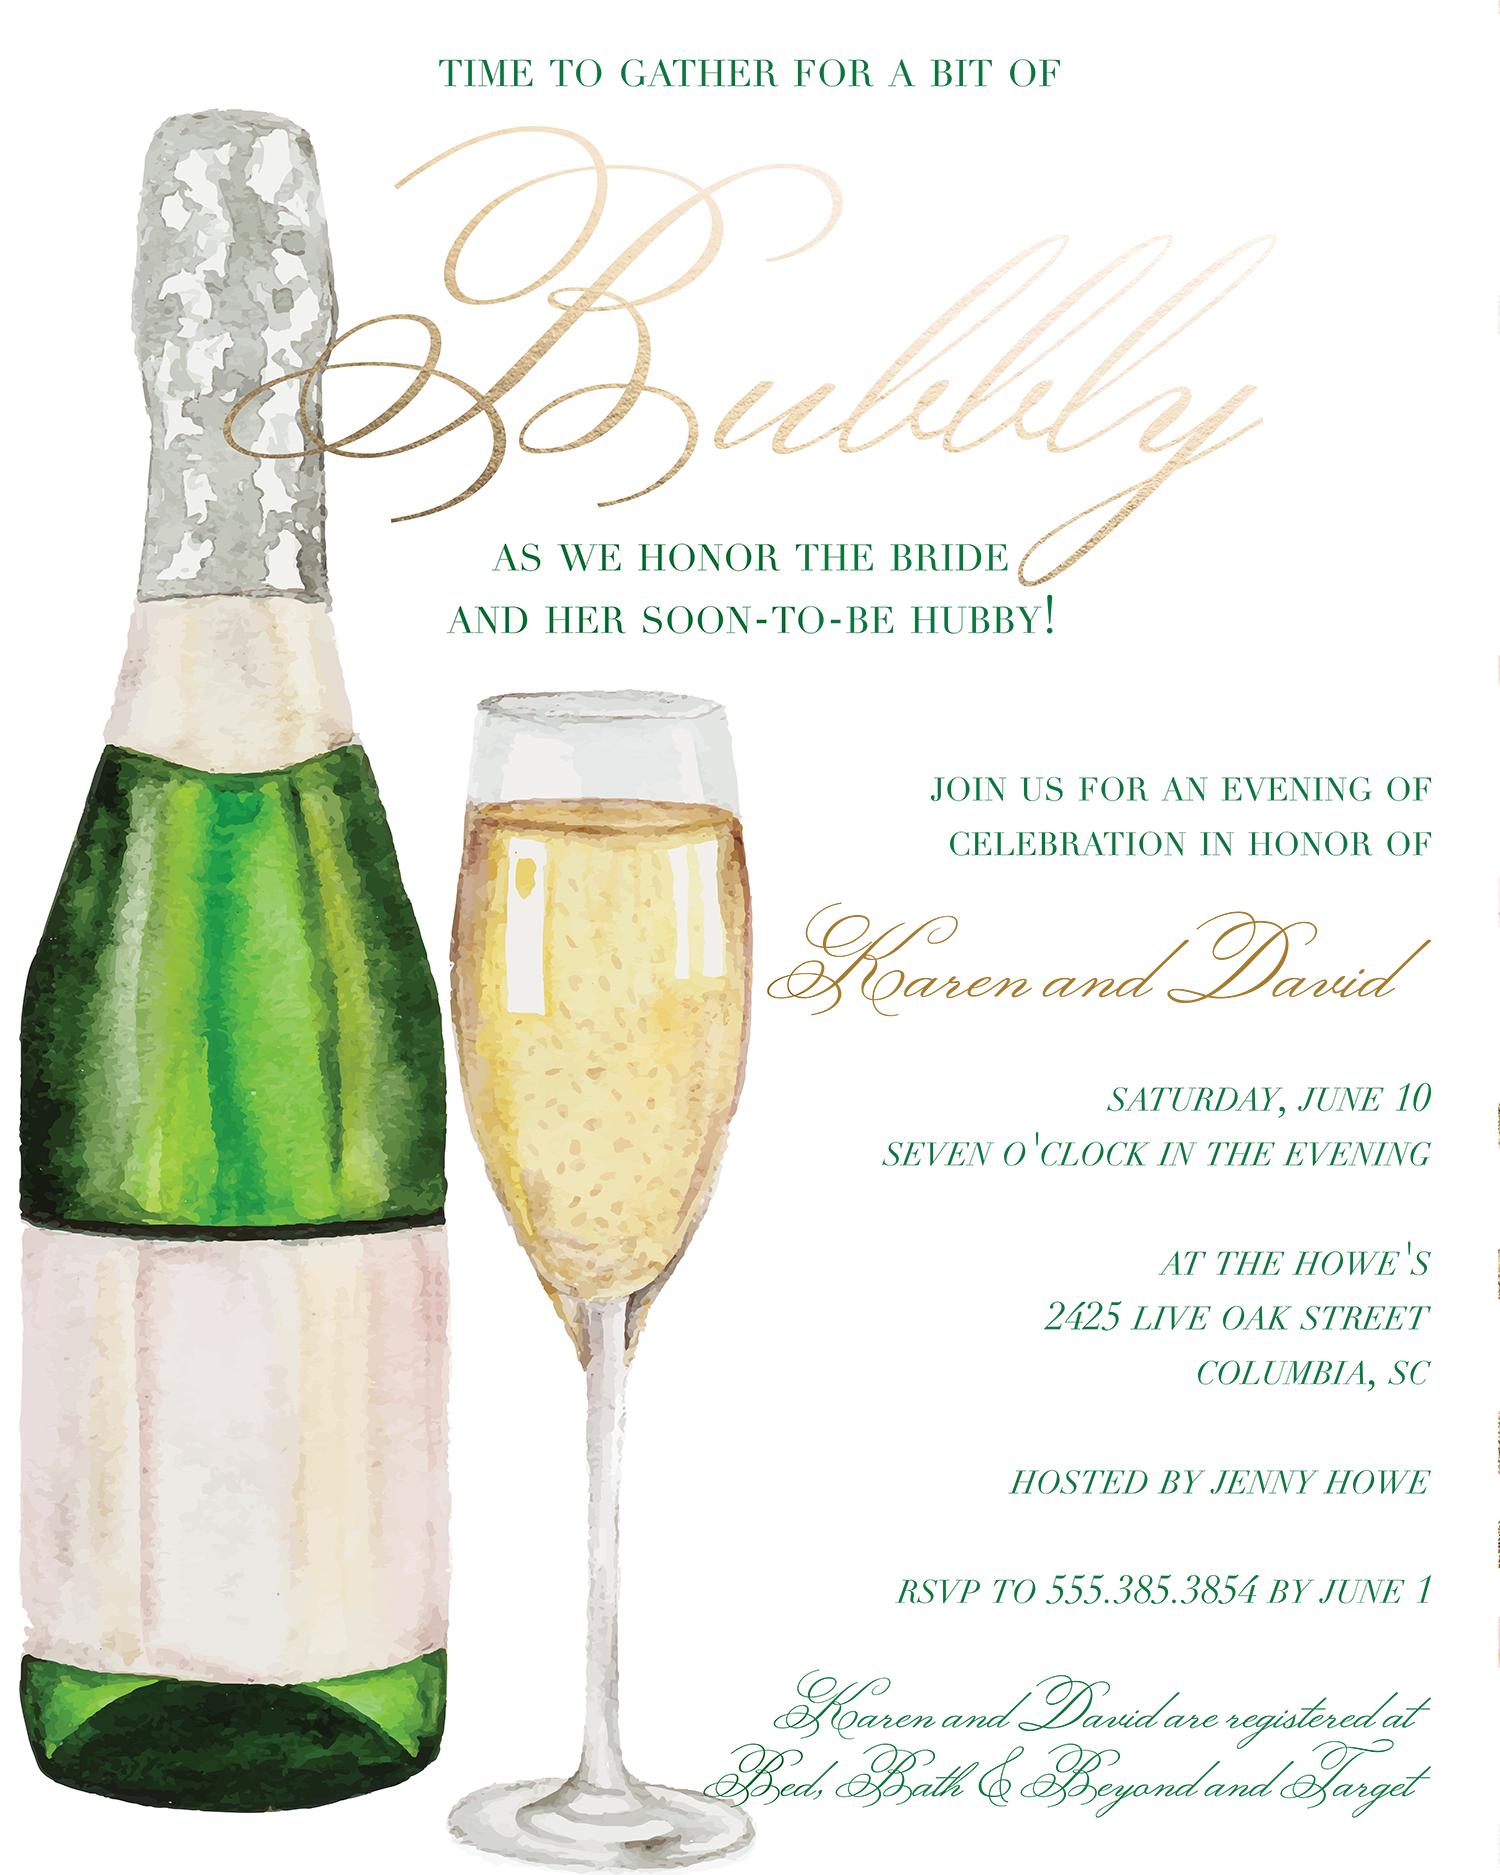 Bridal Shower Invitation Wording: Ideas and Etiquette